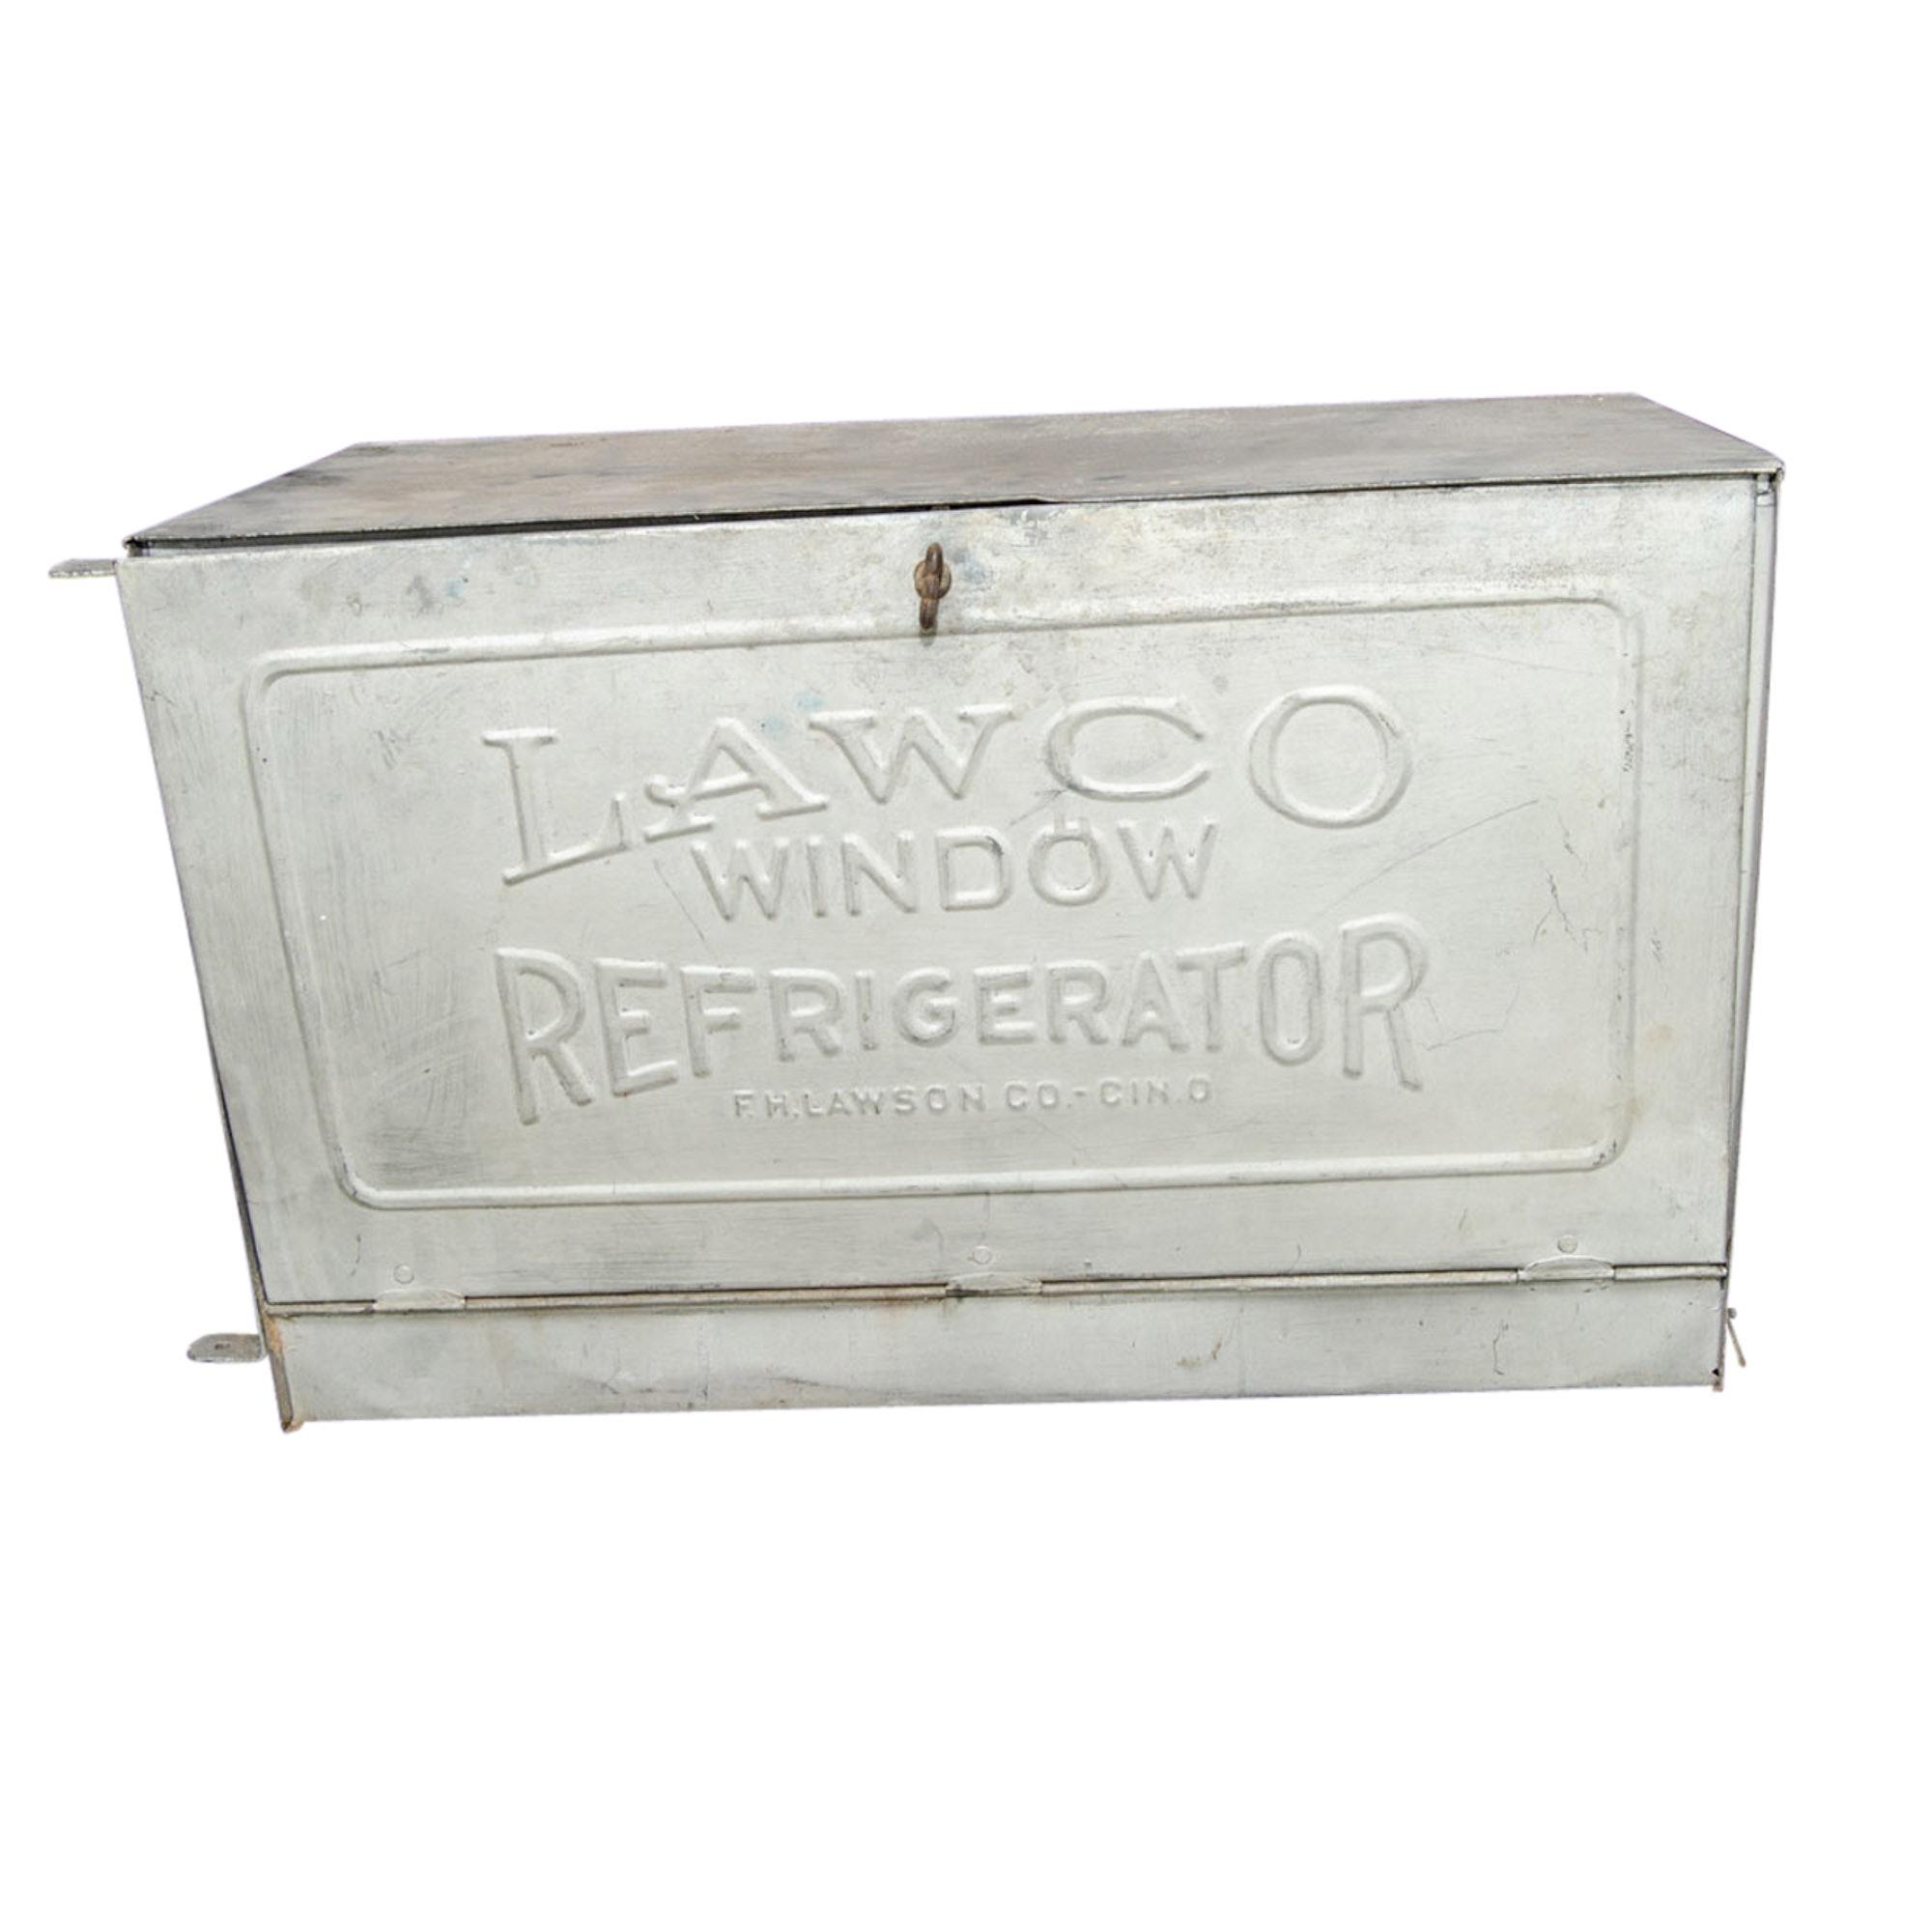 Early 20th-Century Lawco Galvanized Steel Advertising Window Refrigerator